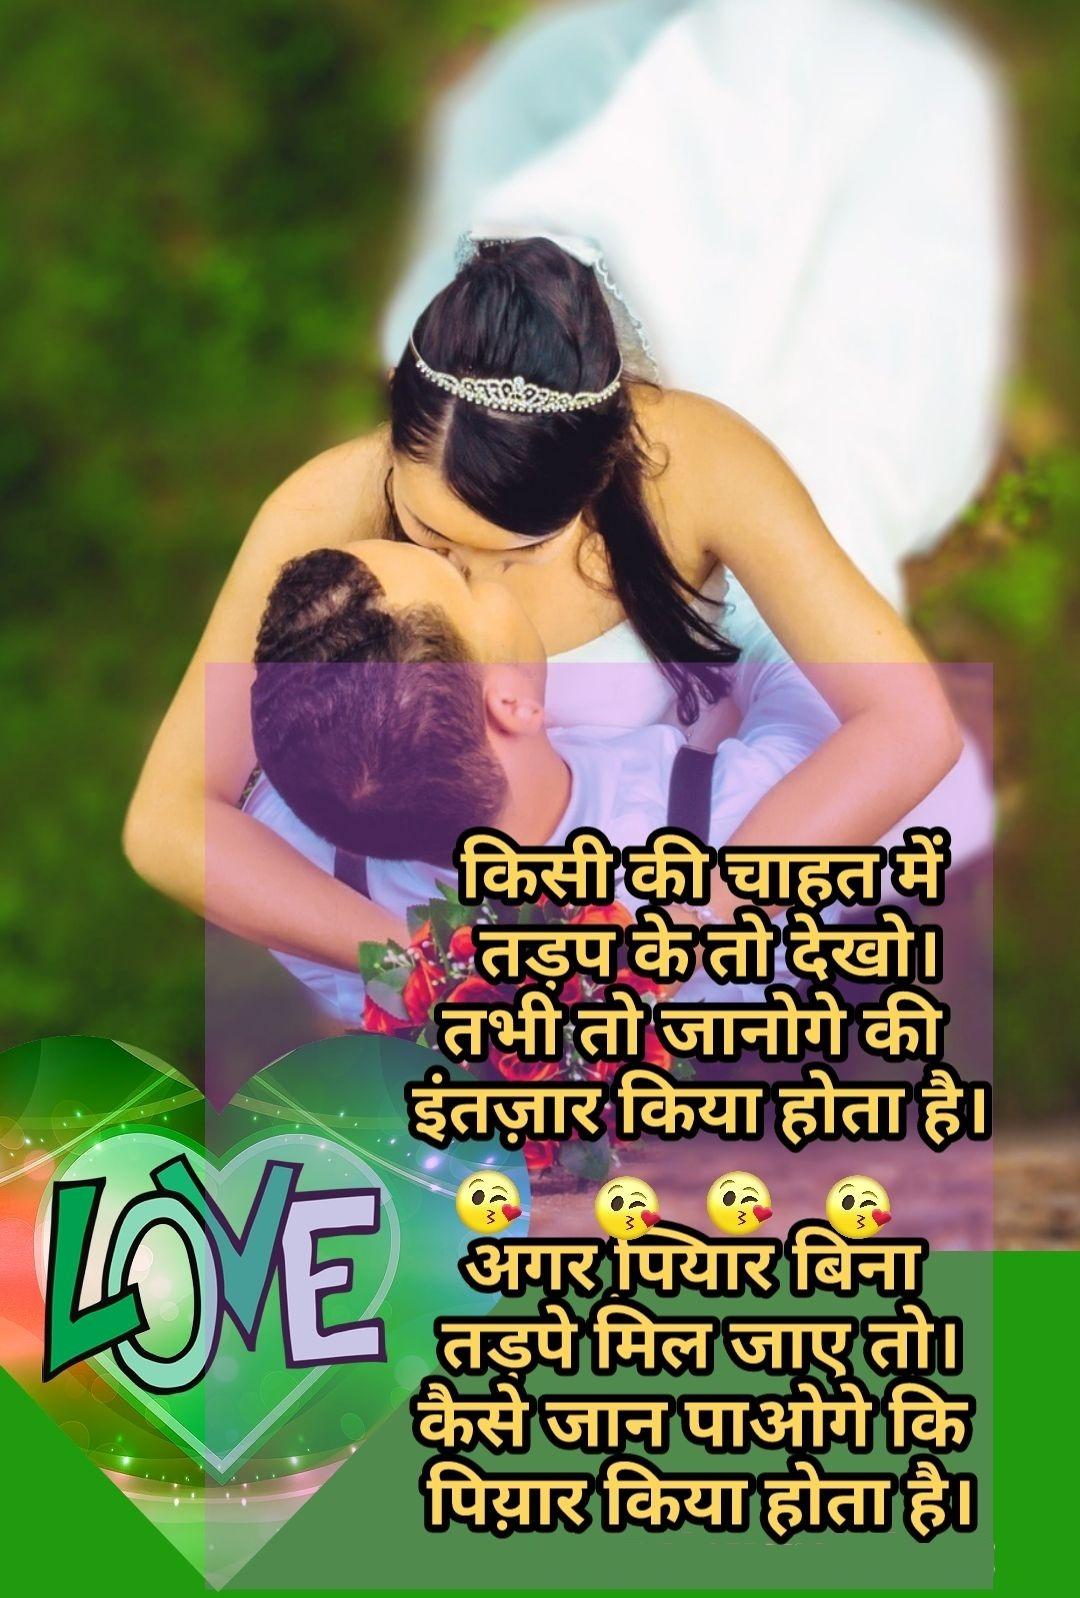 couple photo Shayari